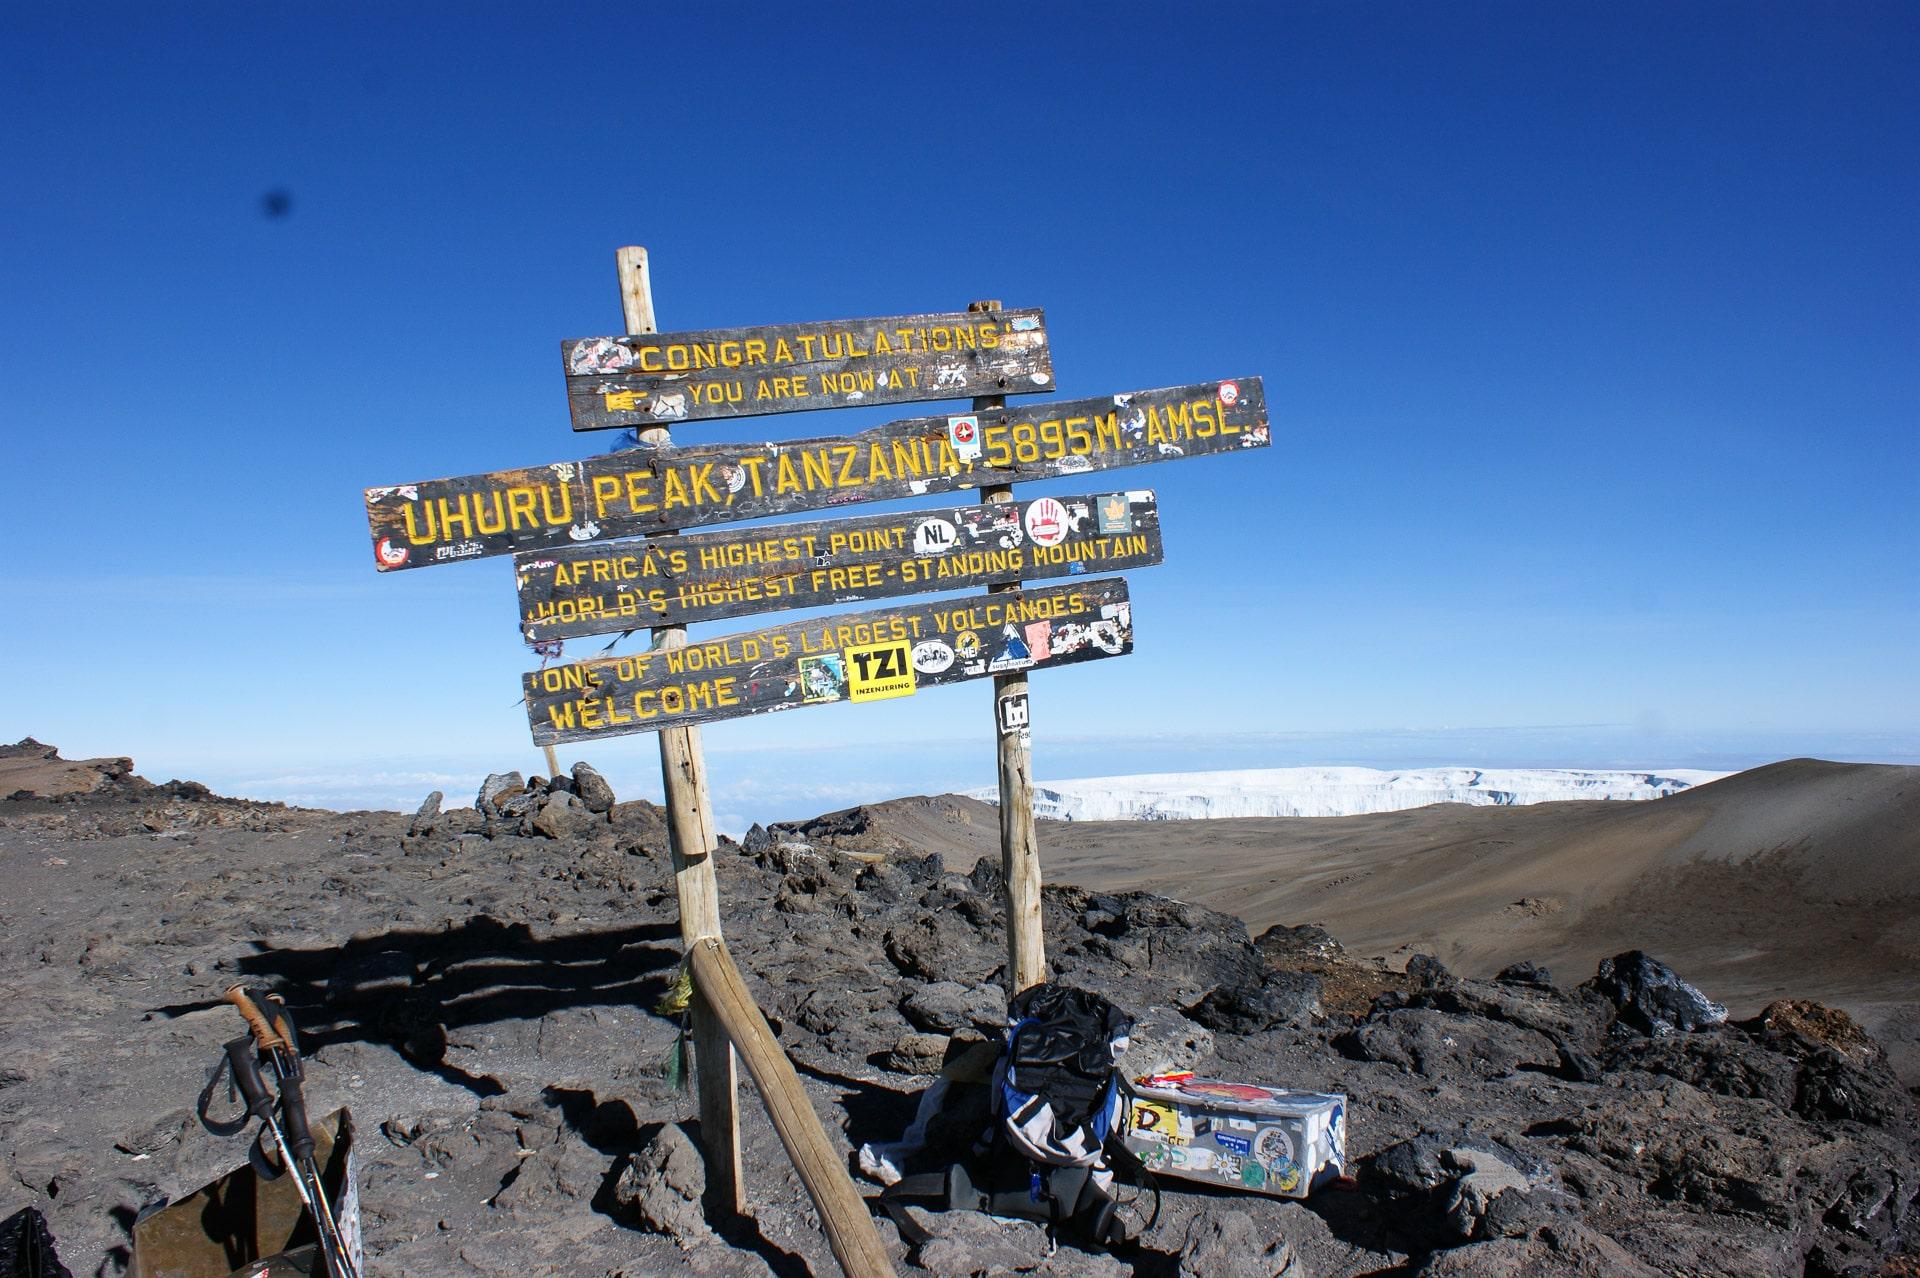 Kilimanjaro-Tansania-Globetrotter-Select-Krause-11